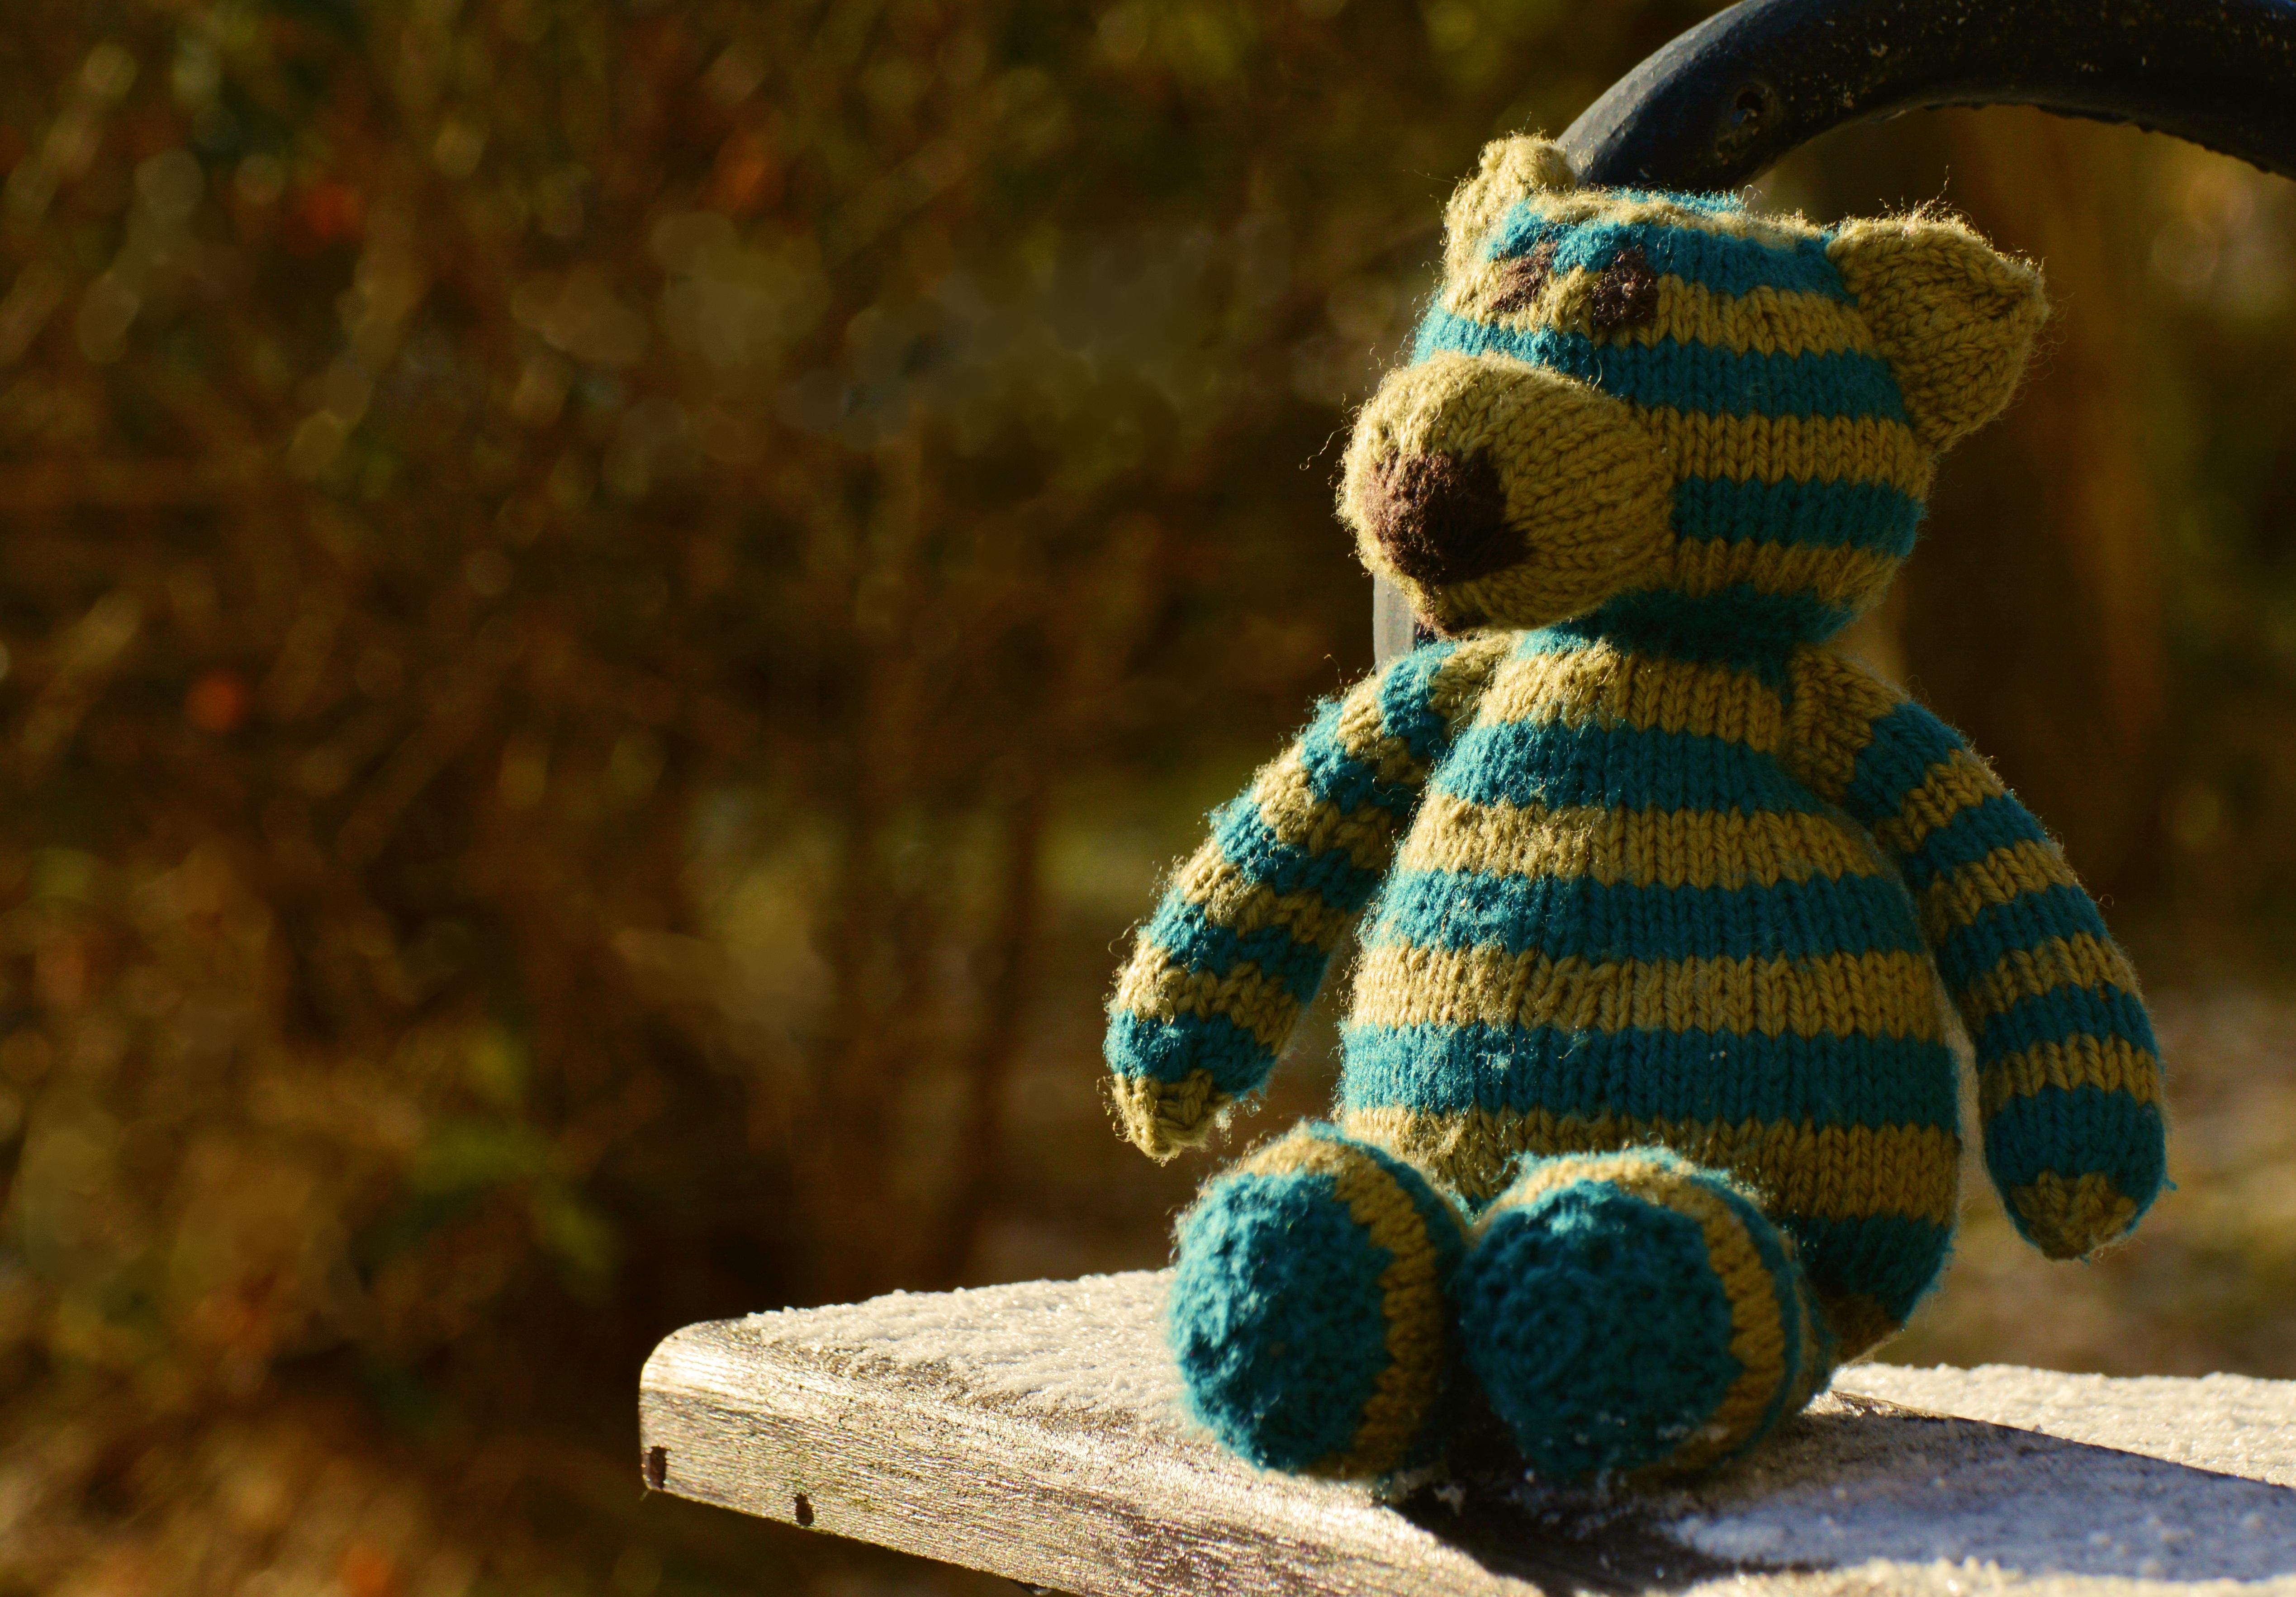 Fotos gratis : solo, verde, solitario, juguete, lana, oso de peluche ...